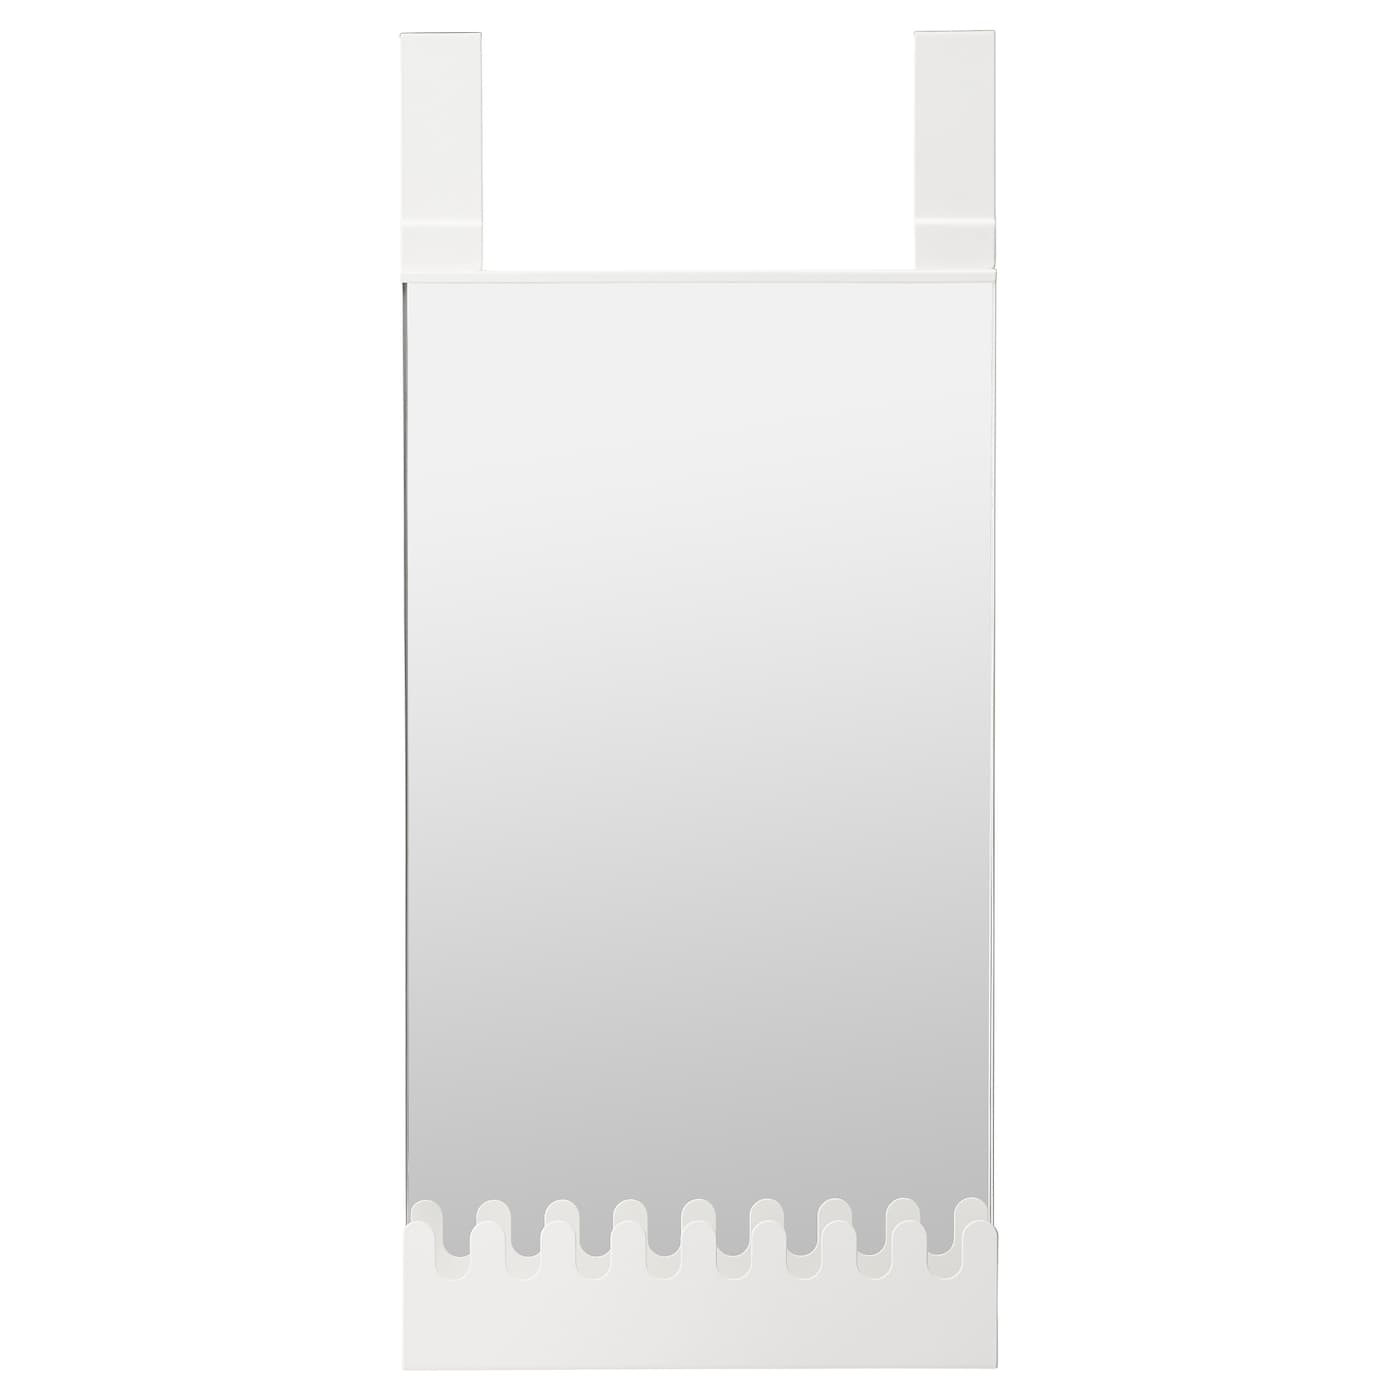 Miroir de chambre miroirs design ikea for Miroir ikea songe